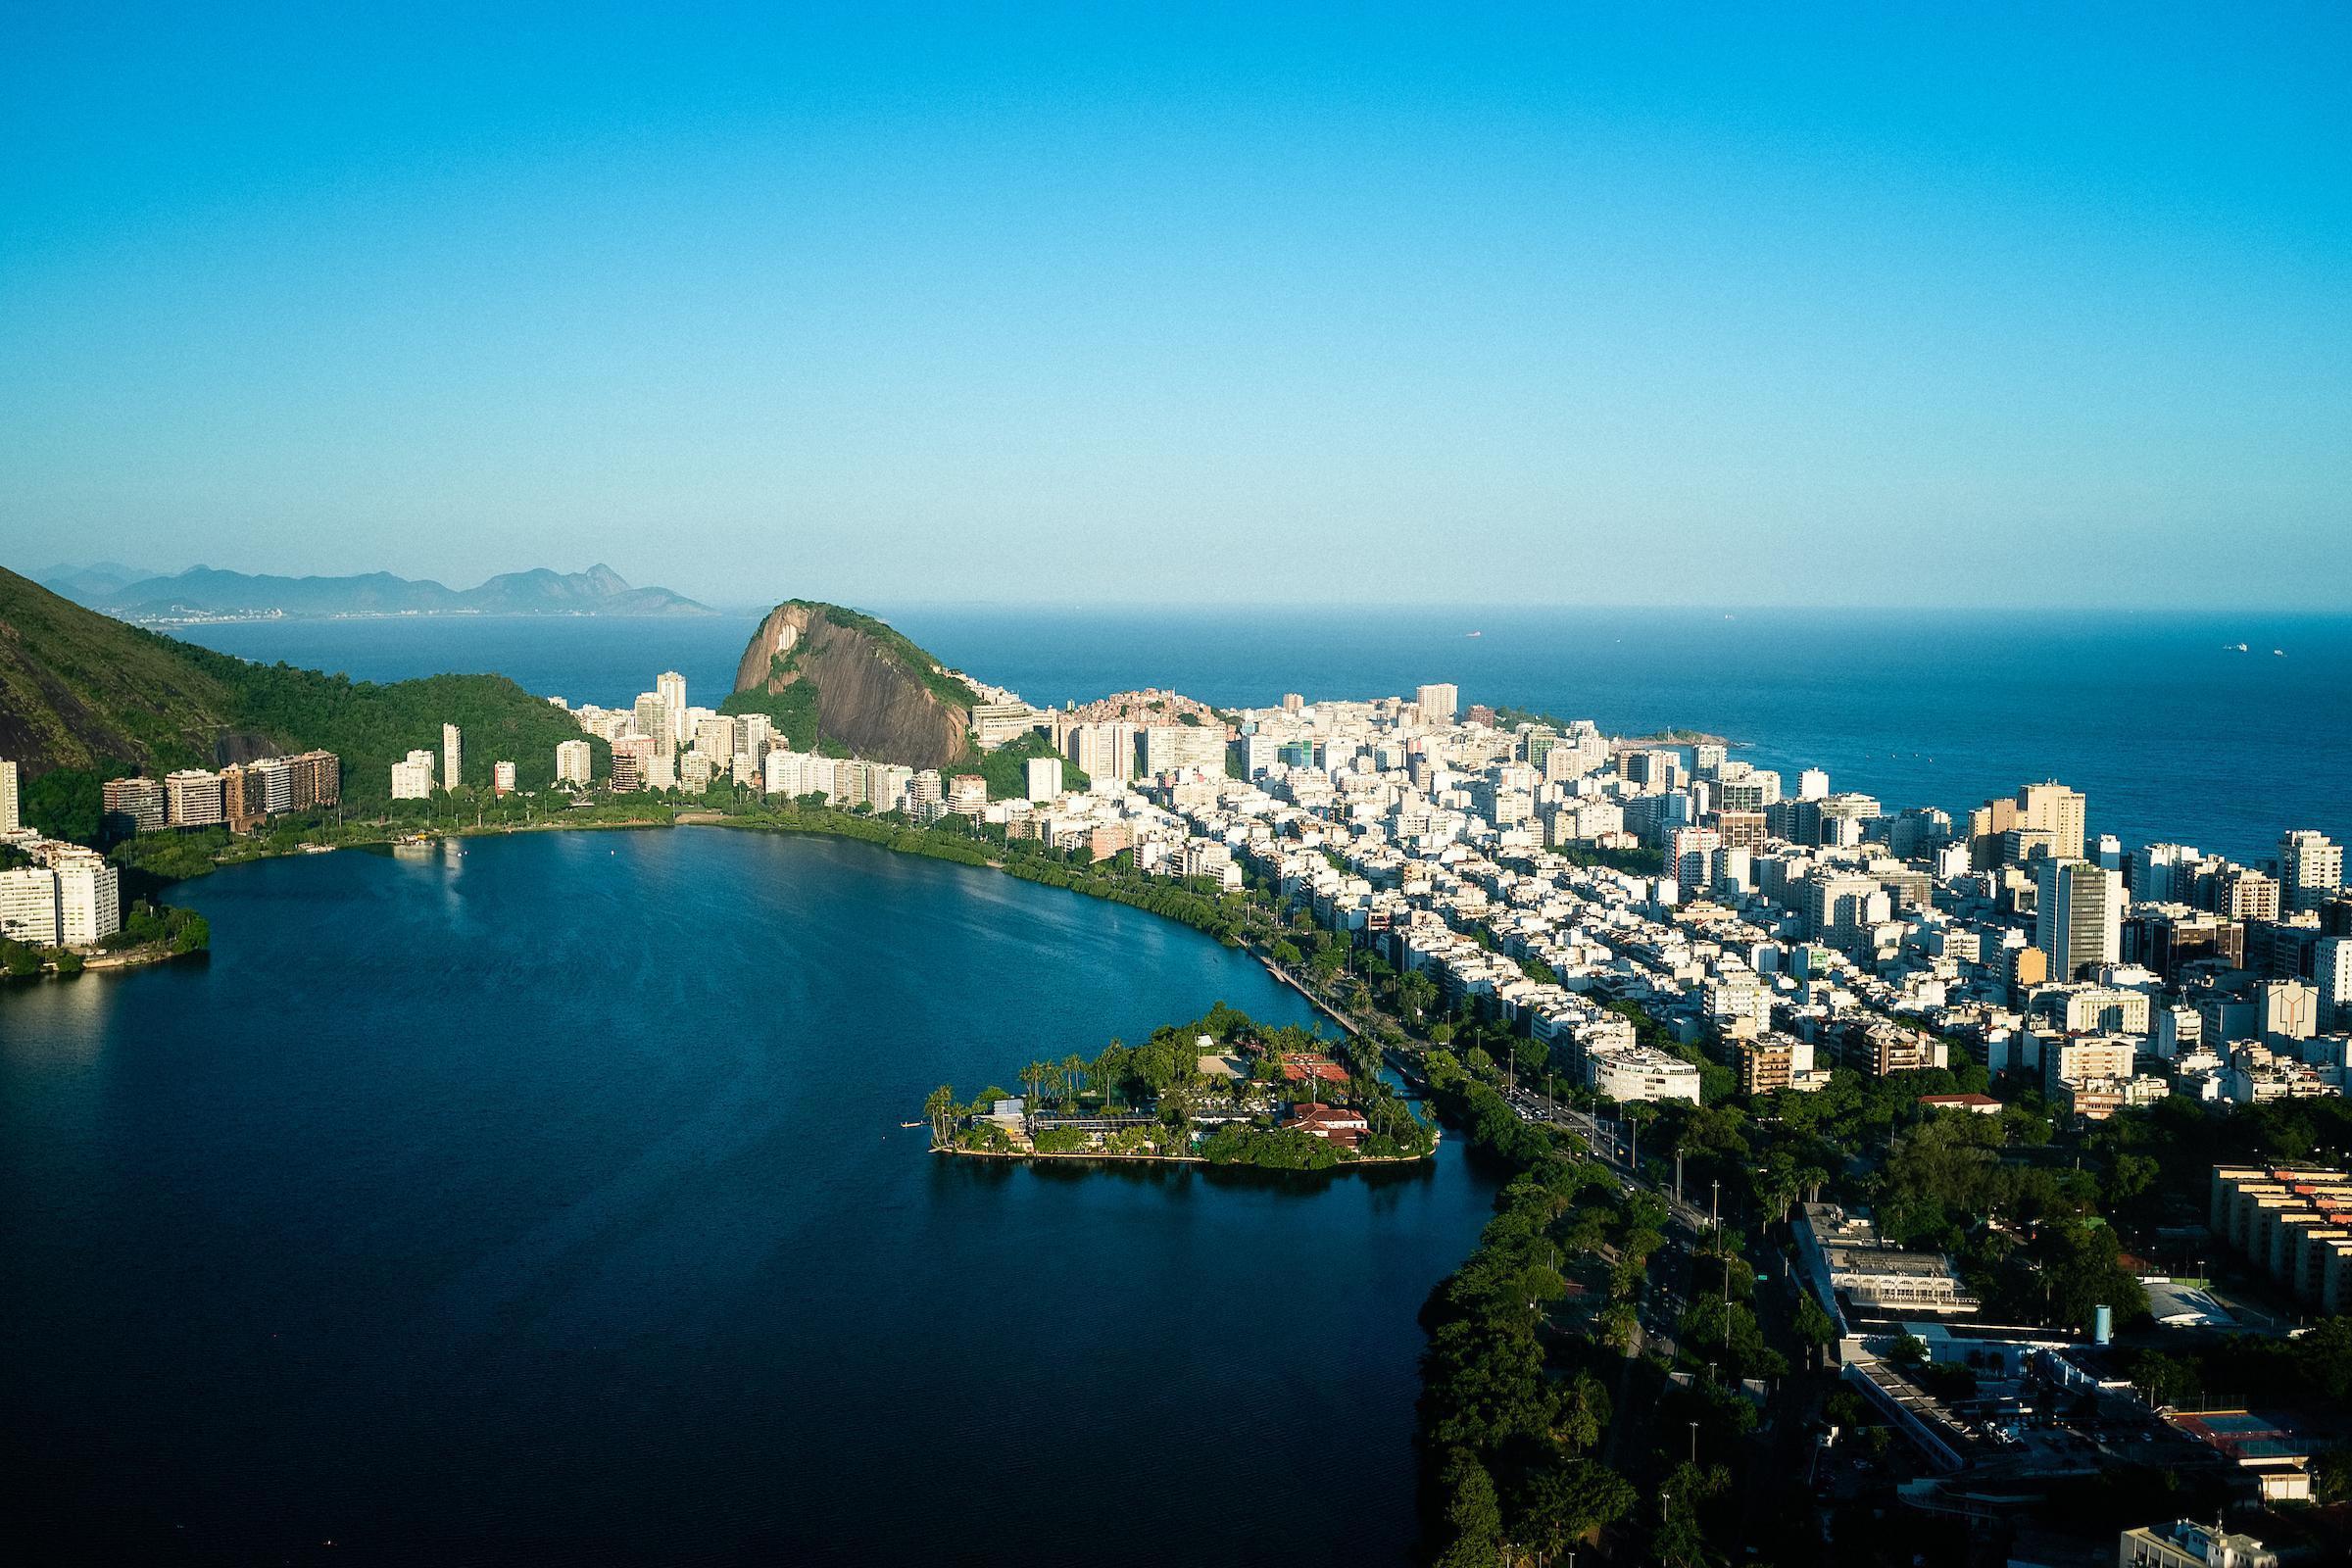 Island Hopping Tours from Rio de Janeiro